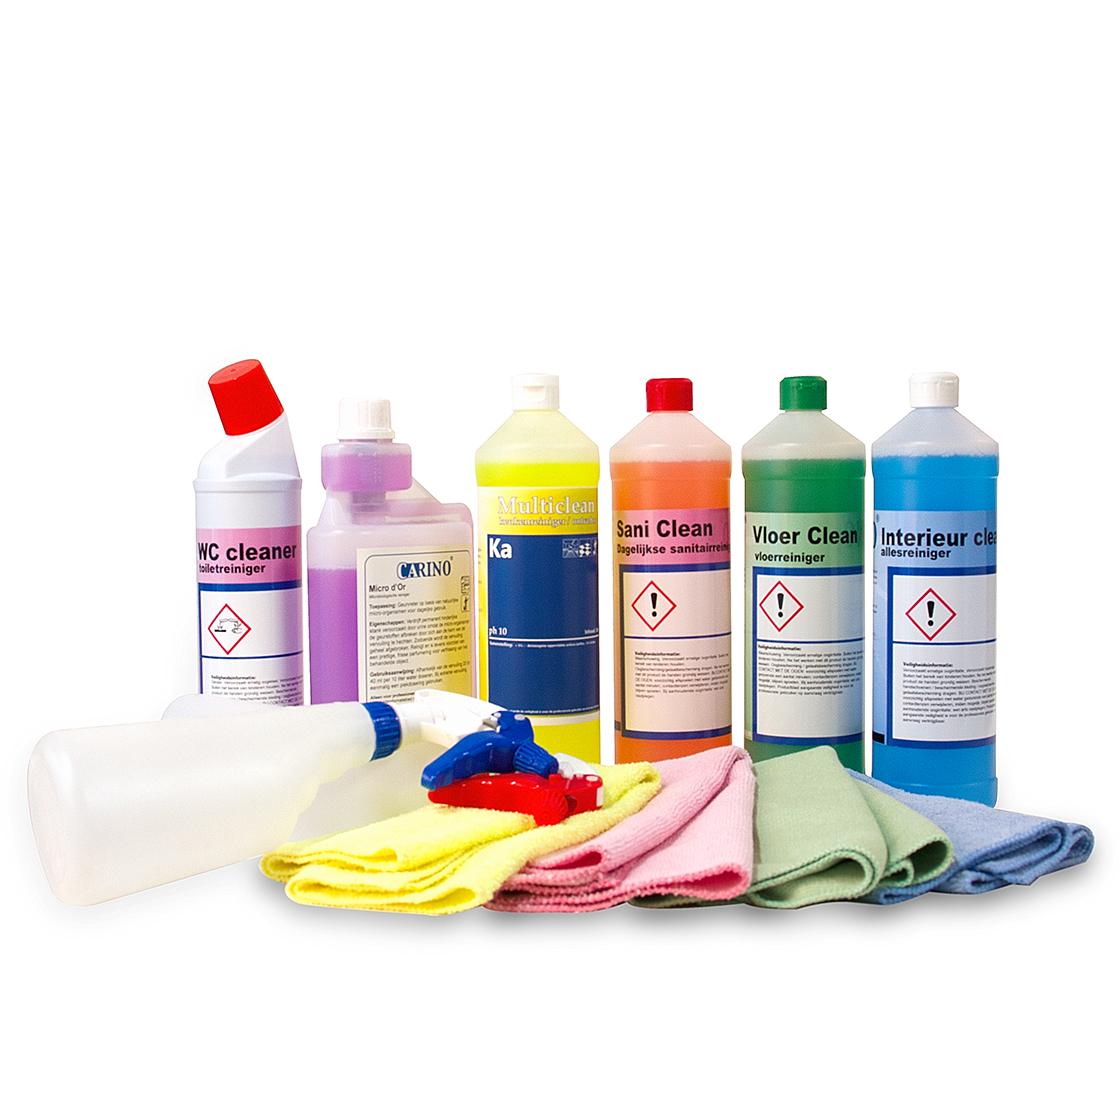 be358c64458 Reinigingsmiddelen set - Smart Cleaning Center